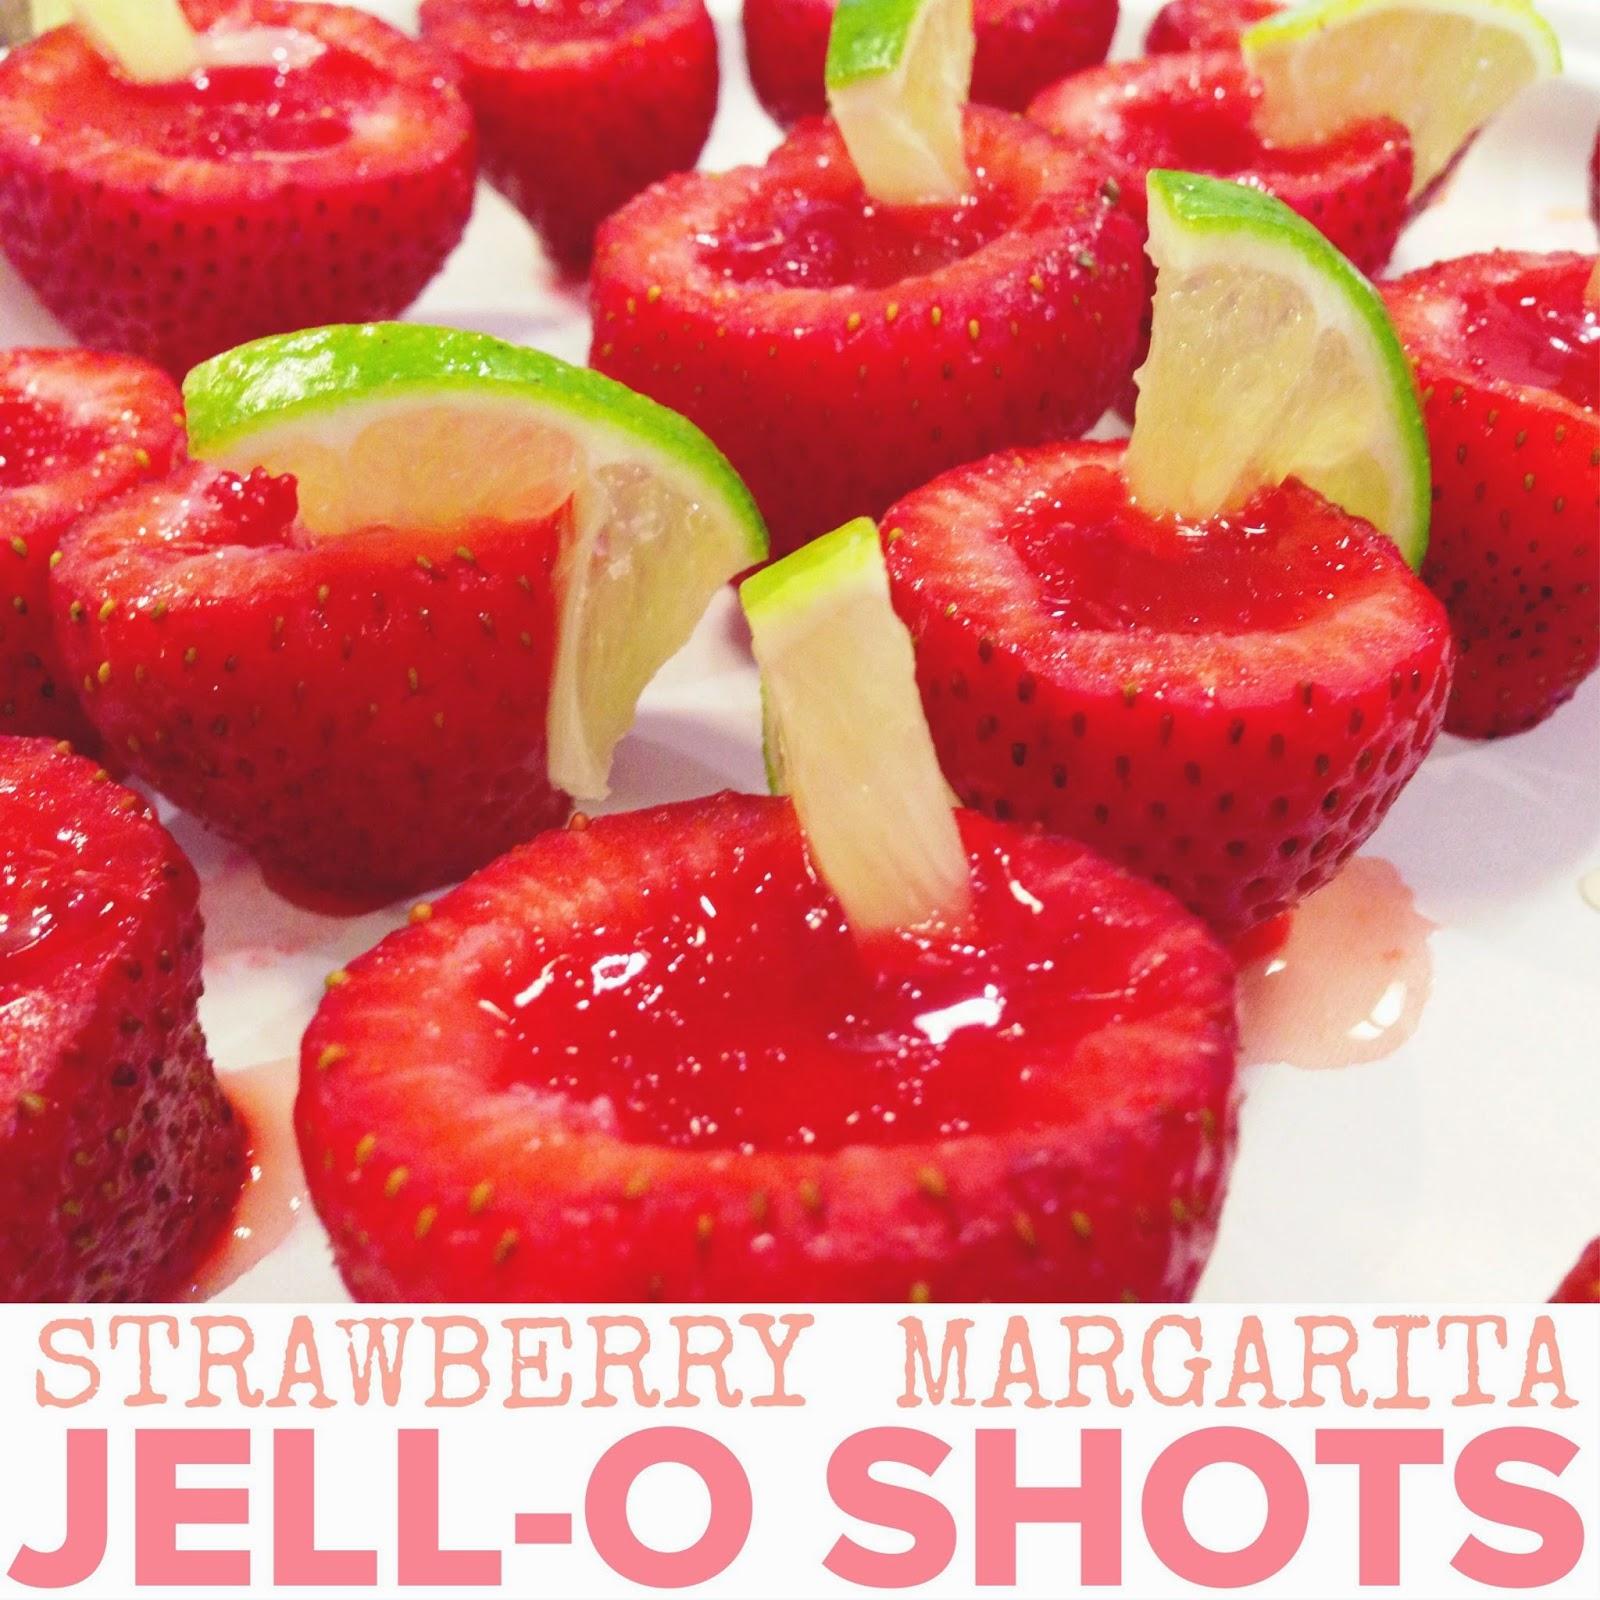 Edible Life in YYC: Strawberry Margarita Jello Shots